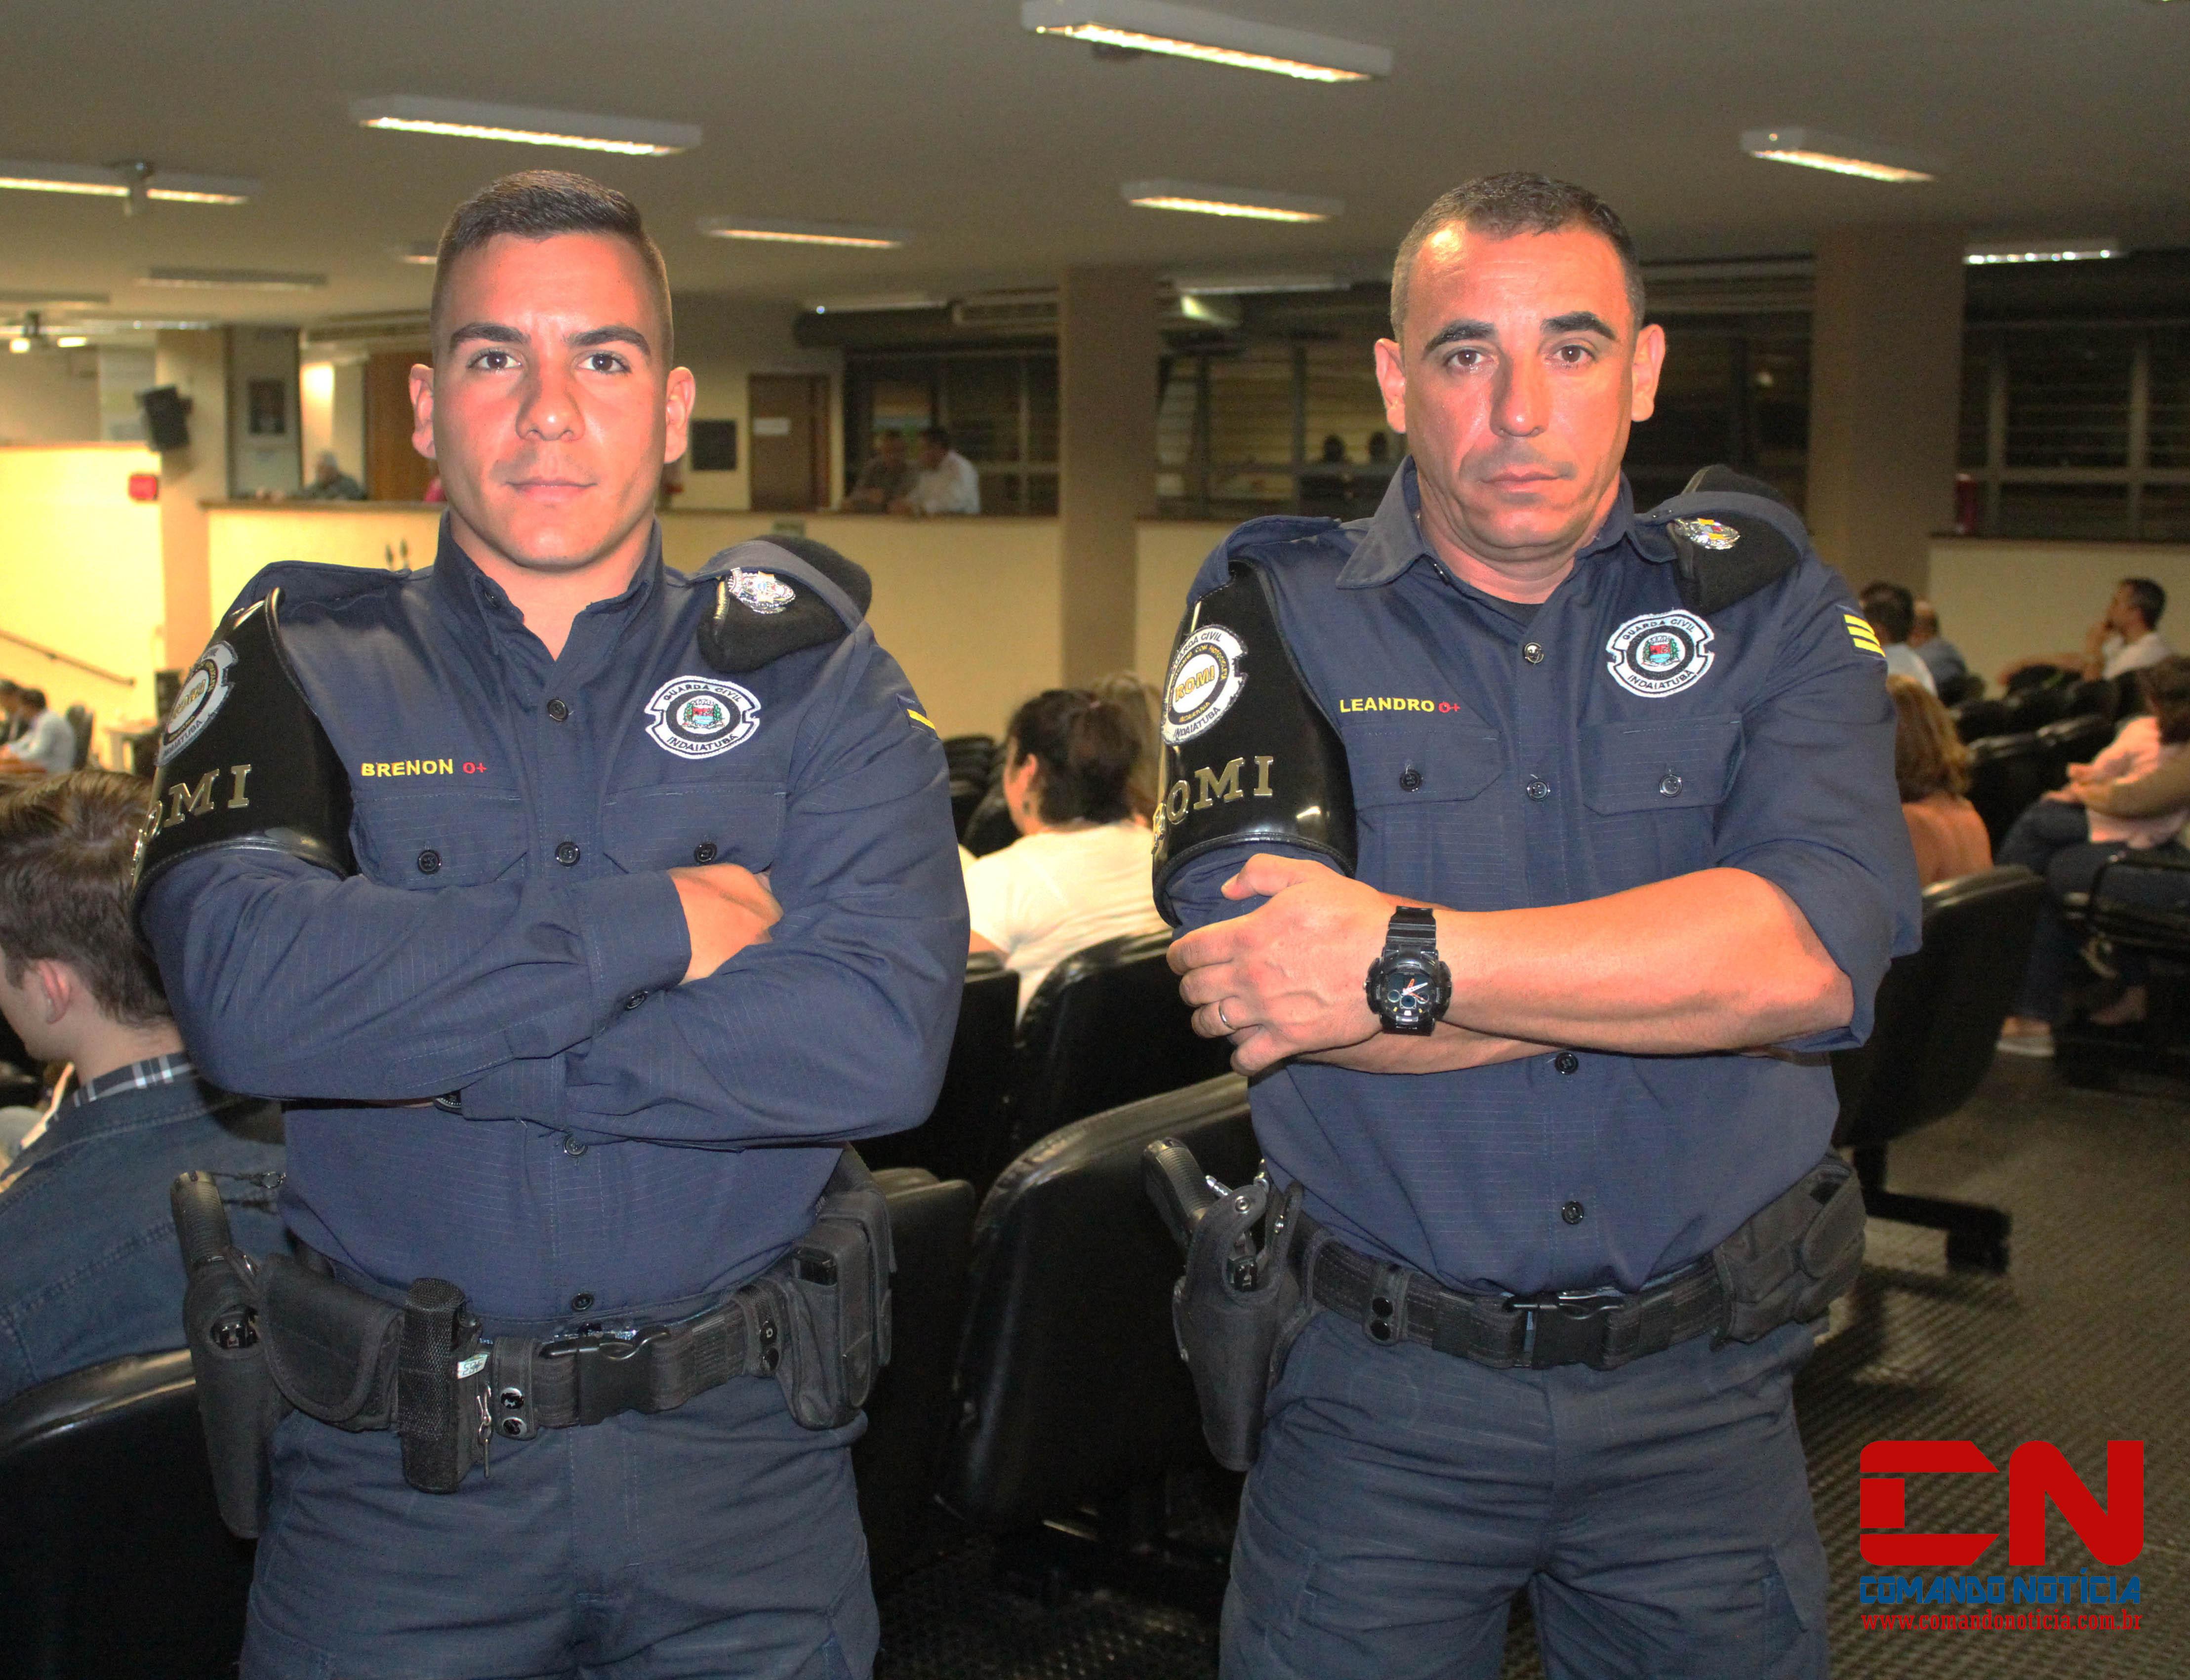 camara guardas